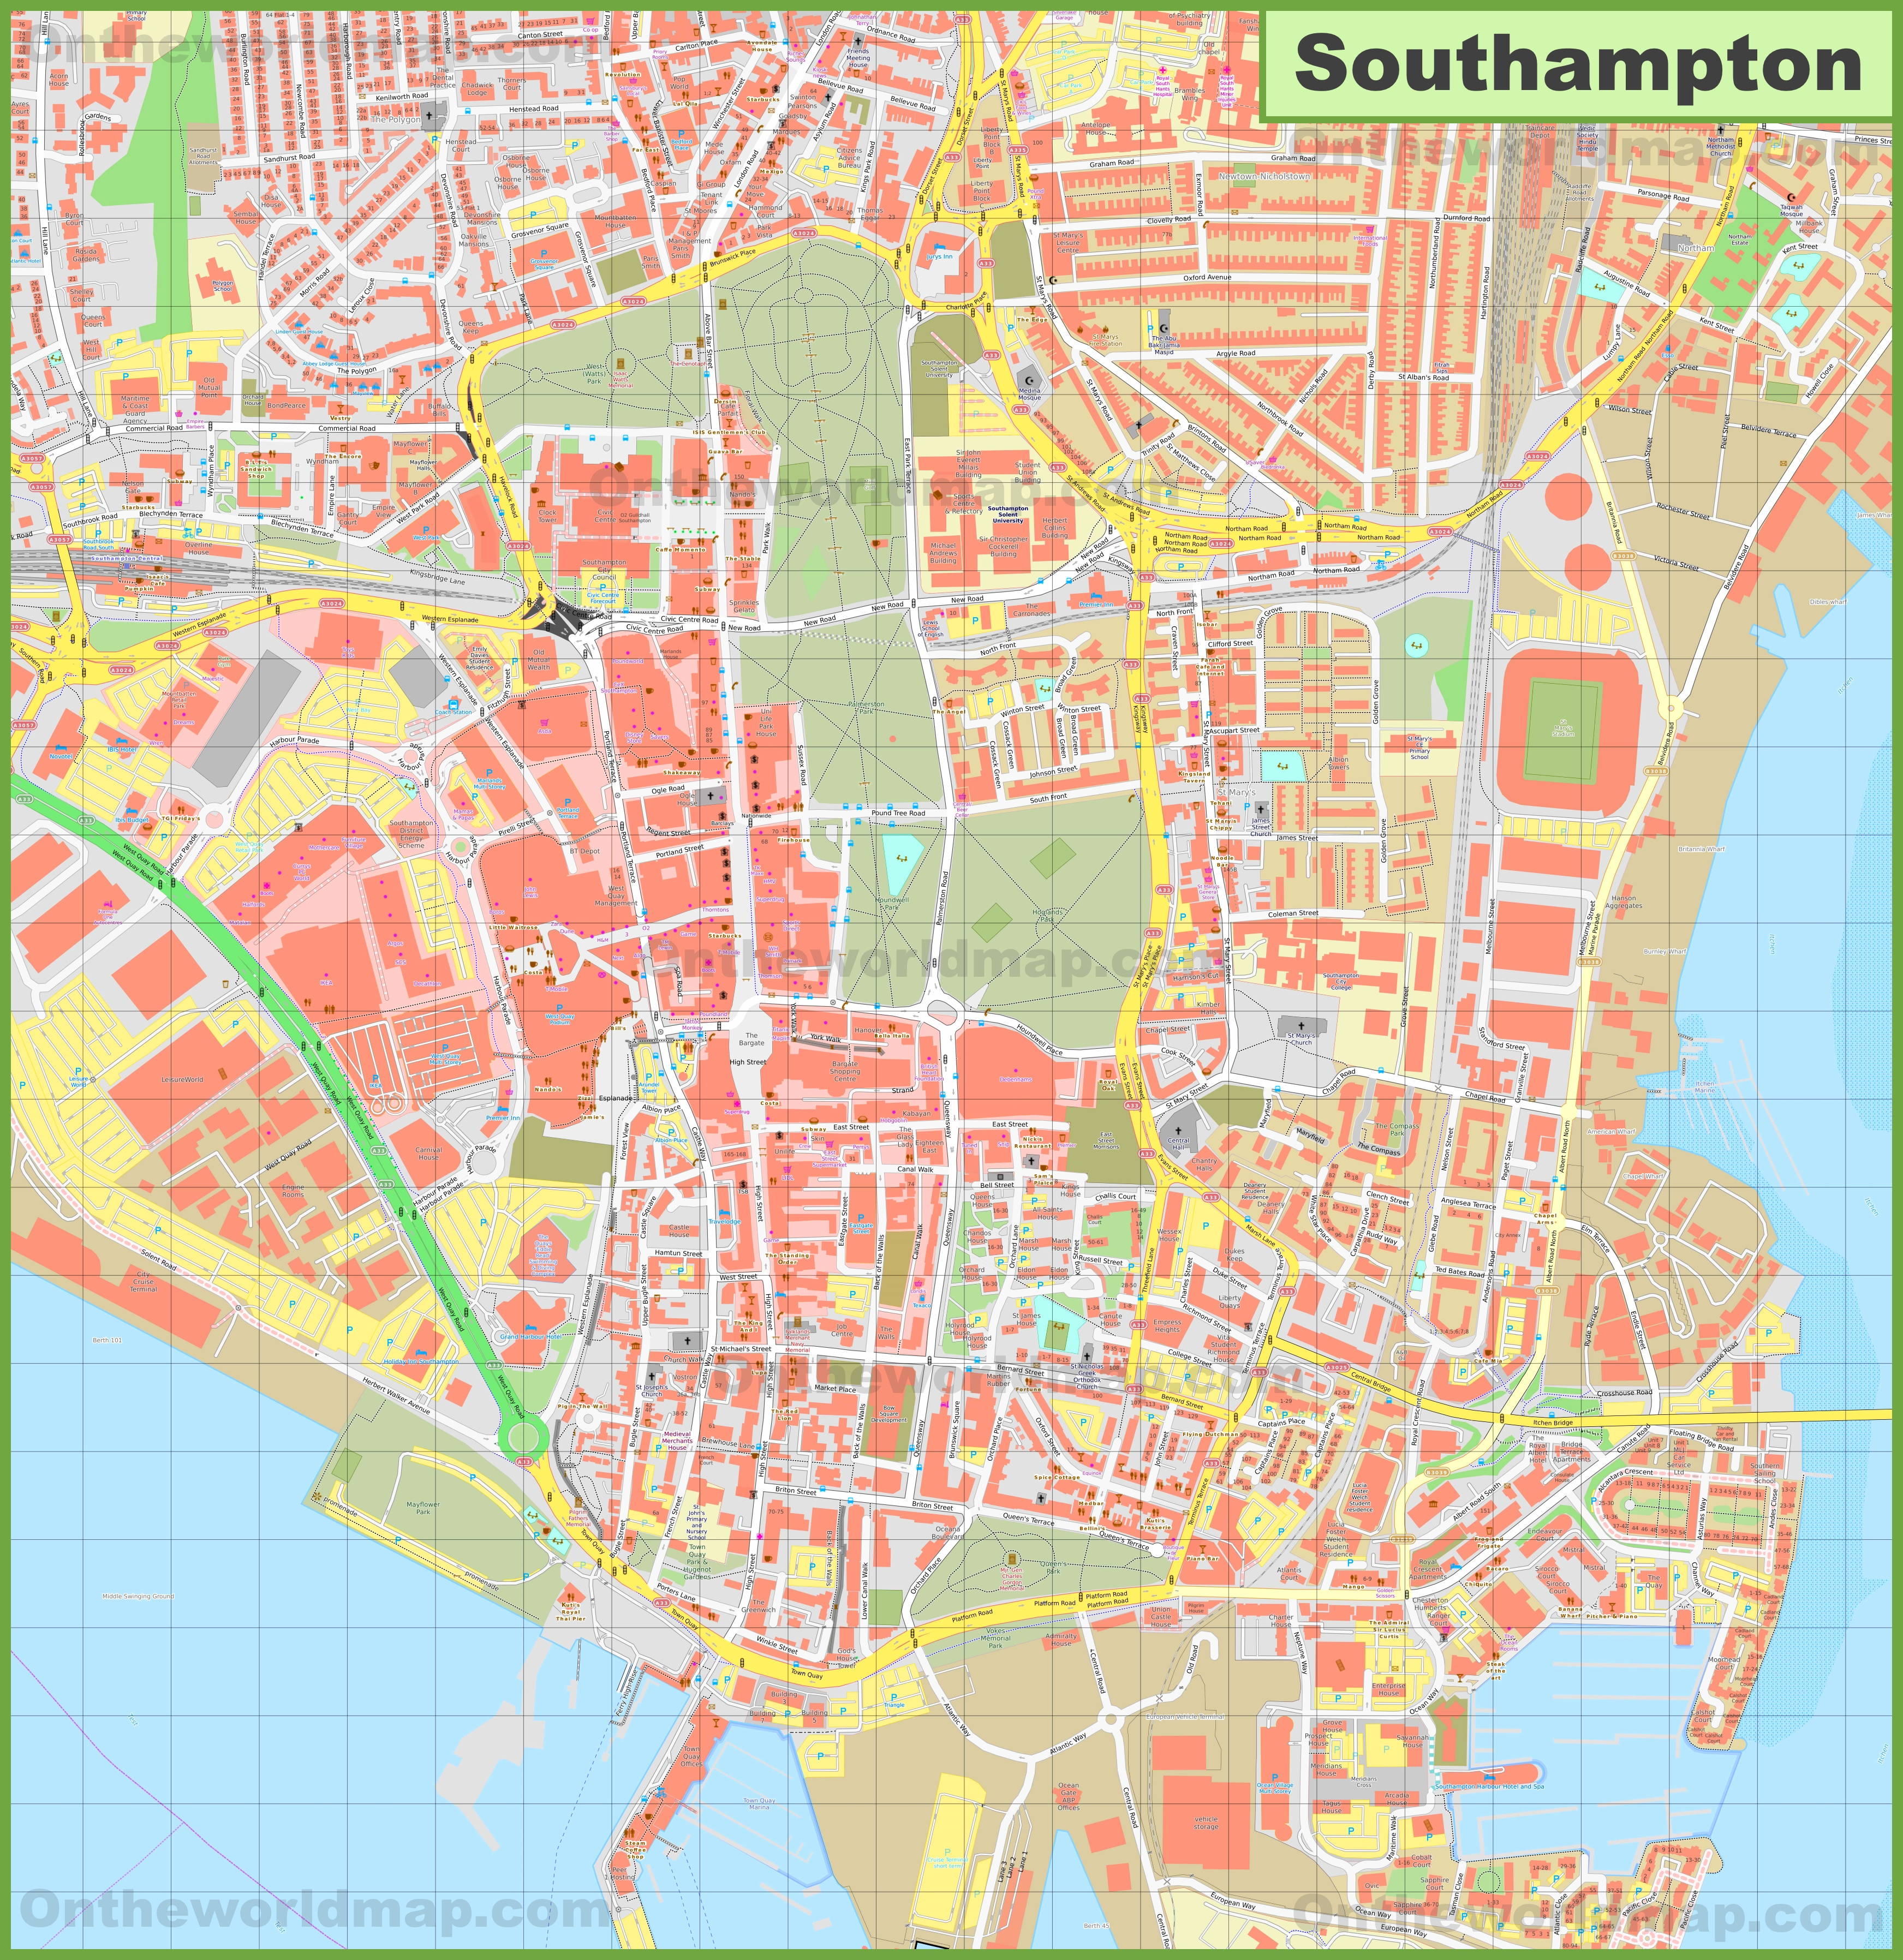 Map Of Southampton Southampton city center map Map Of Southampton